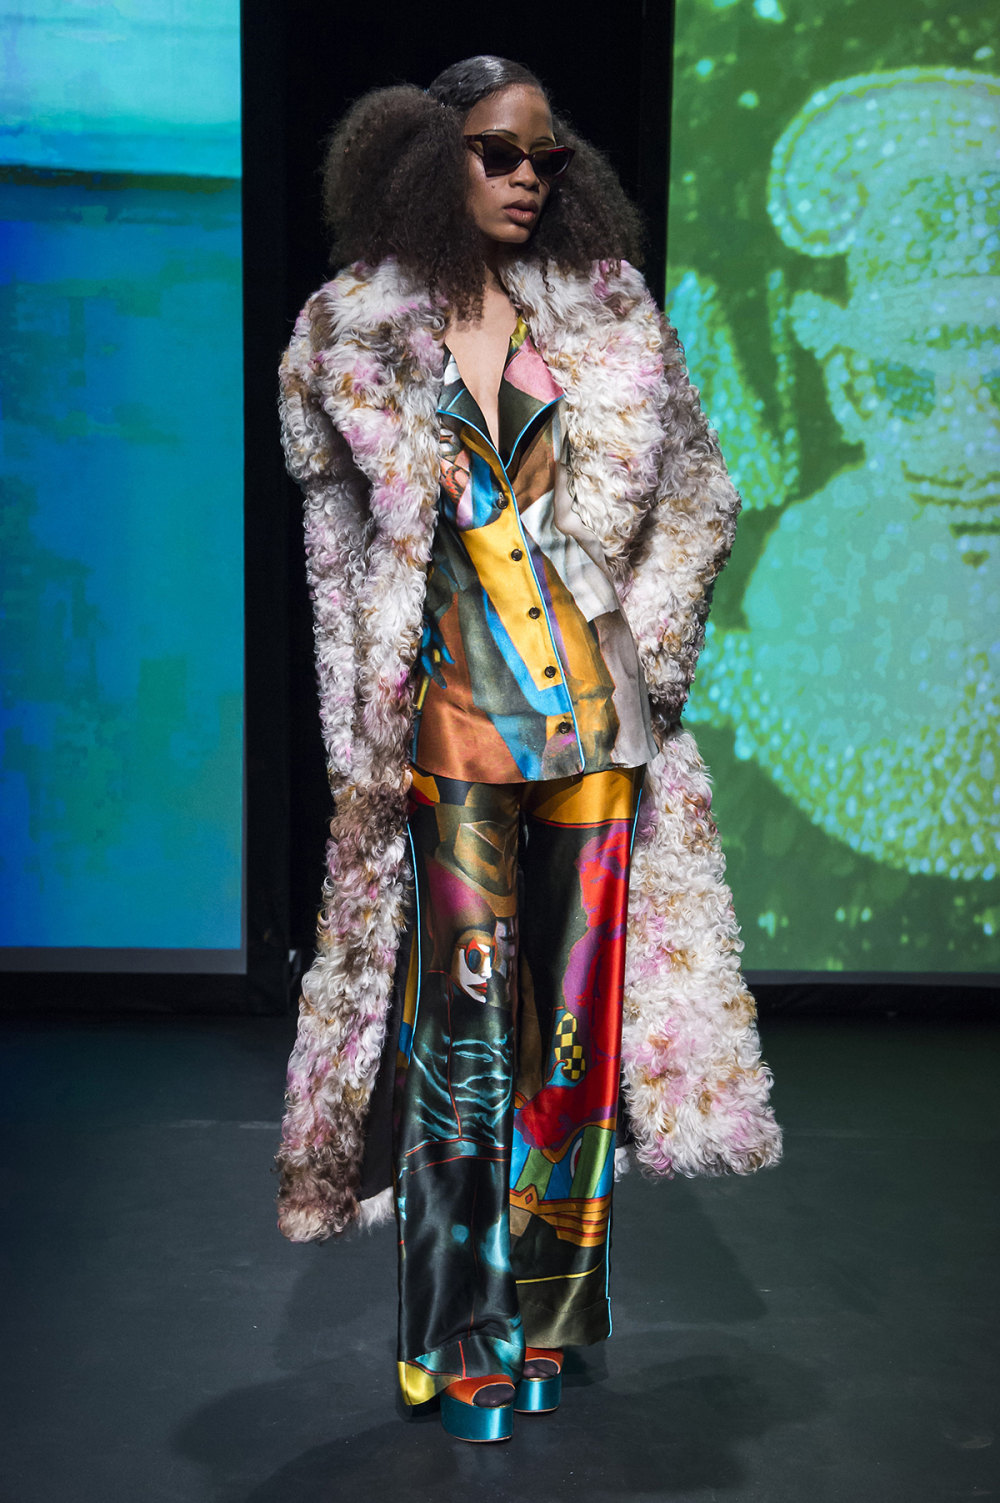 16Arlington时装系列标志性的時尚单色西装外还有更大胆的版本-12.jpg